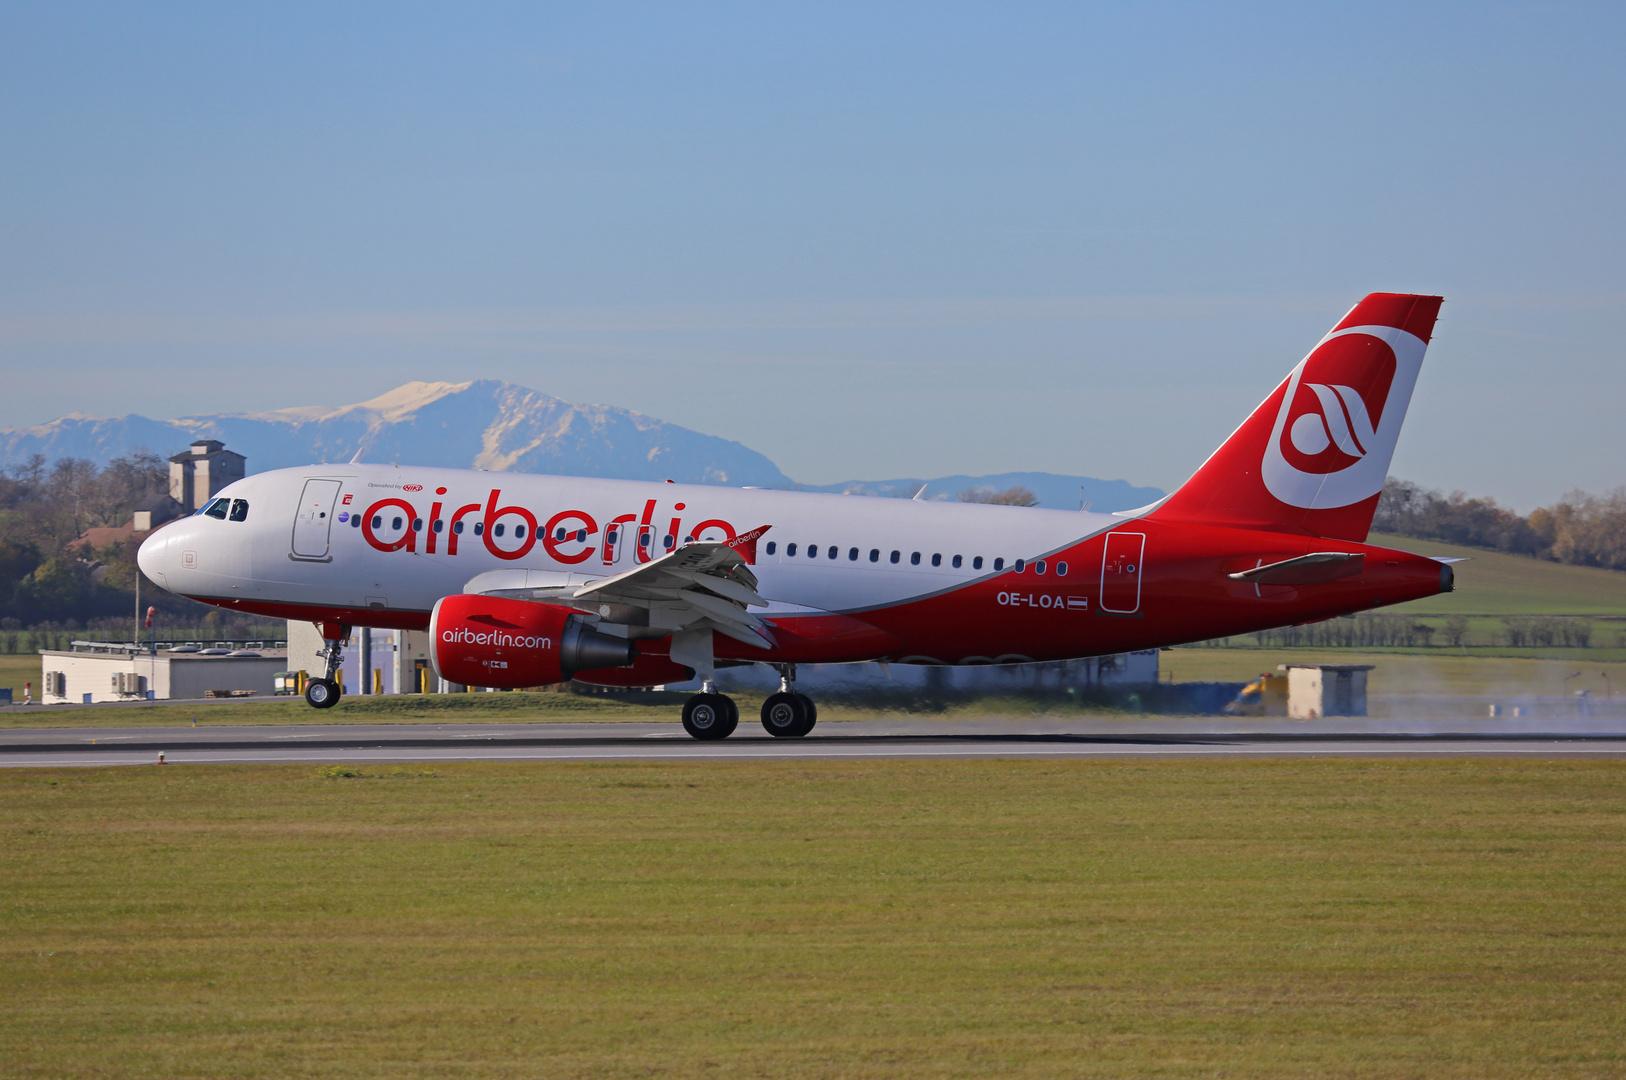 'Airbus A319-112'